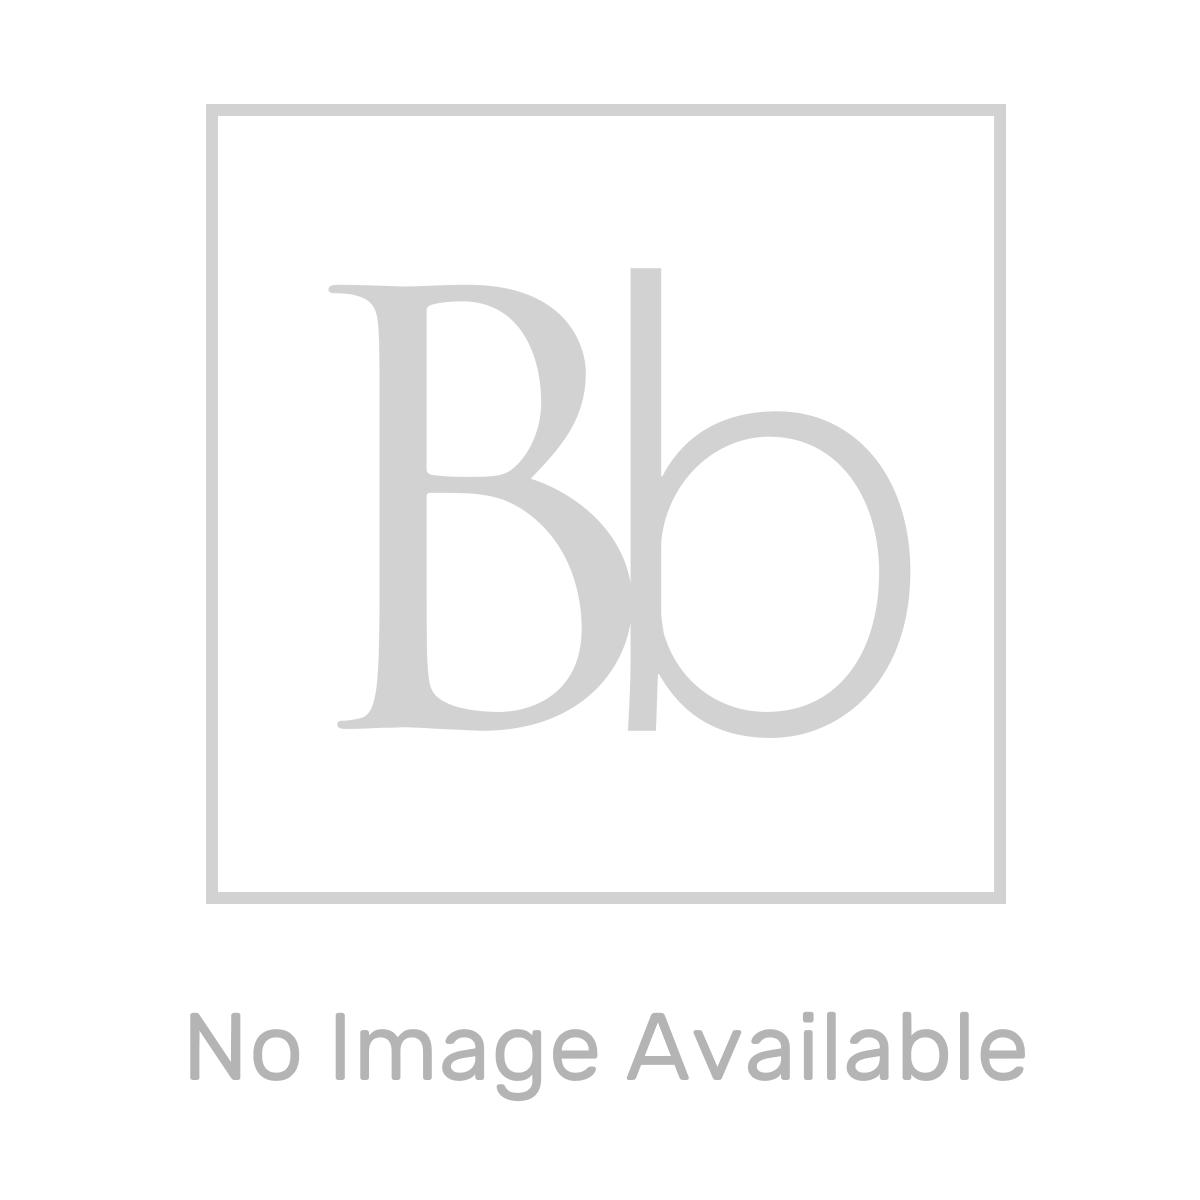 Kartell K-vit Chrome Plan Soap Dish